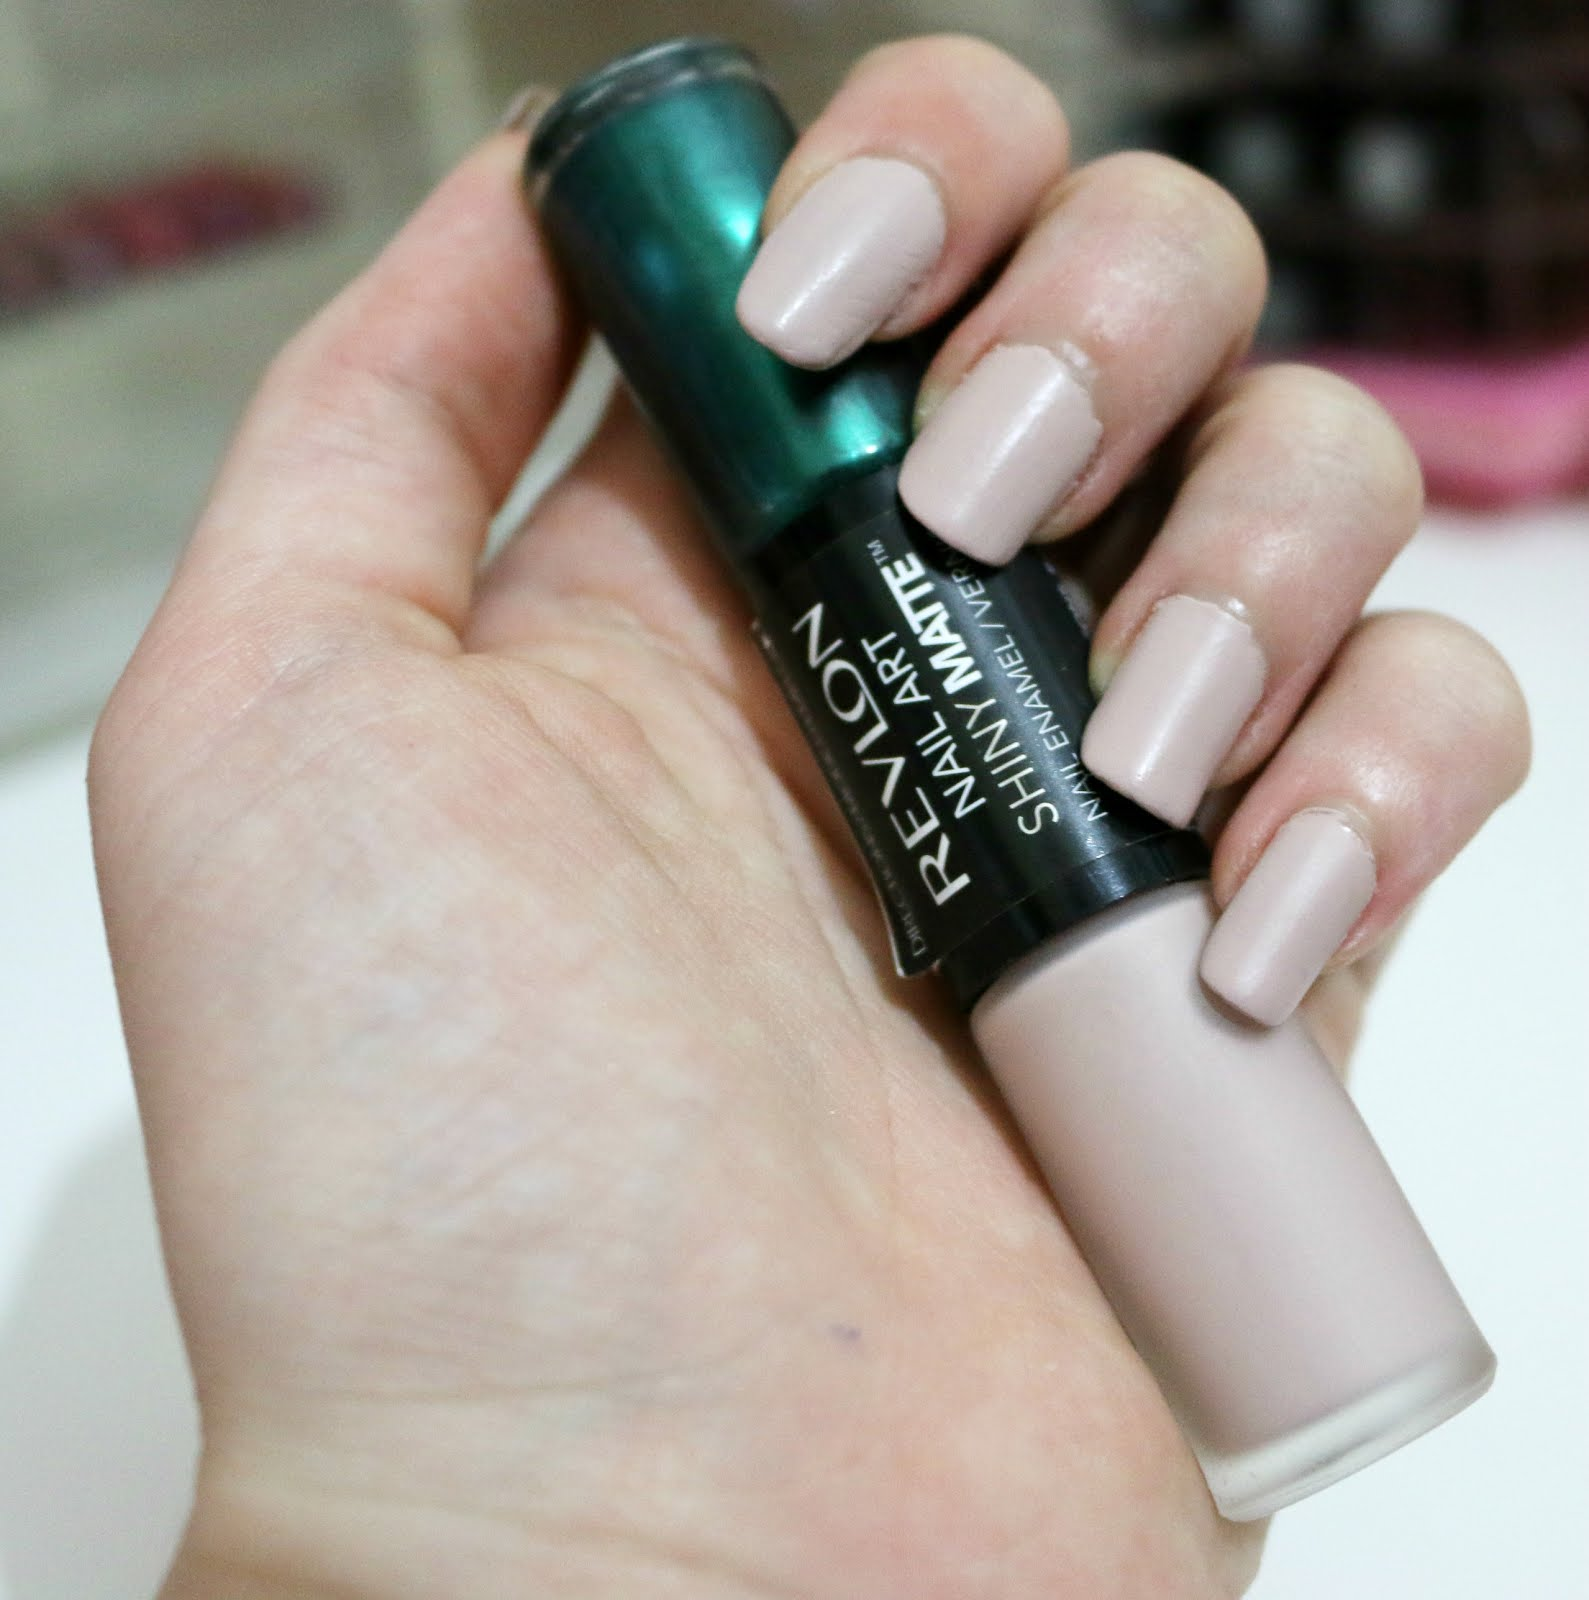 Revlon Nail Art Shiny Matte Duo Review The Lipstick Hub The